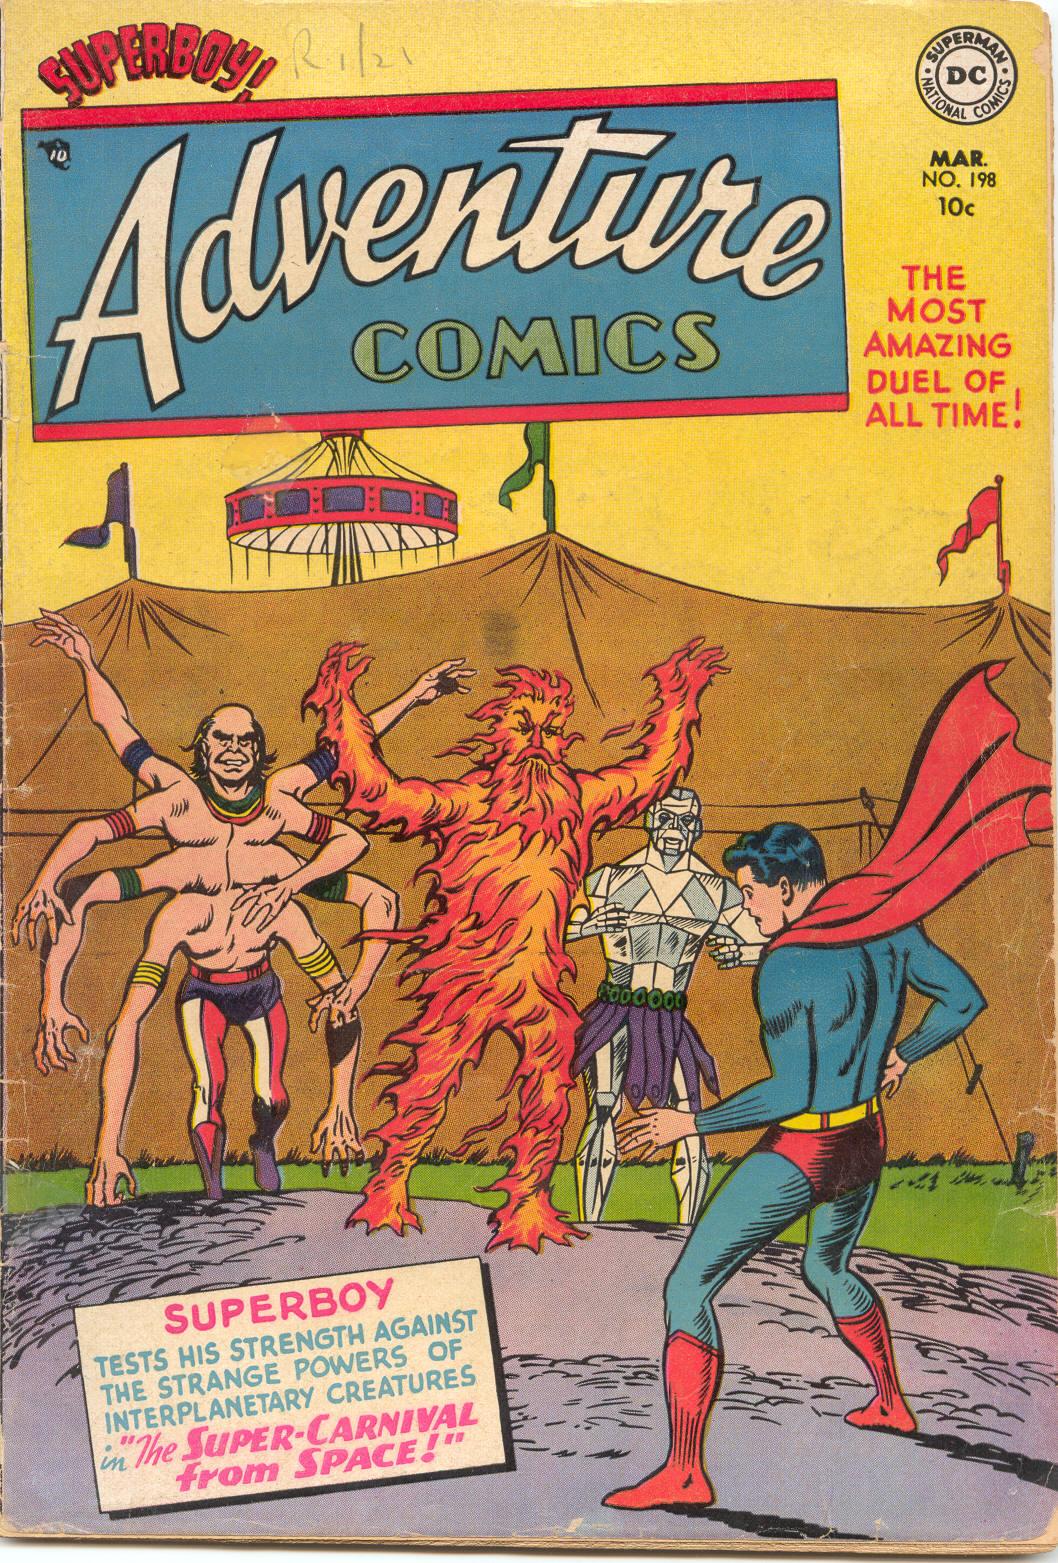 Read online Adventure Comics (1938) comic -  Issue #198 - 1